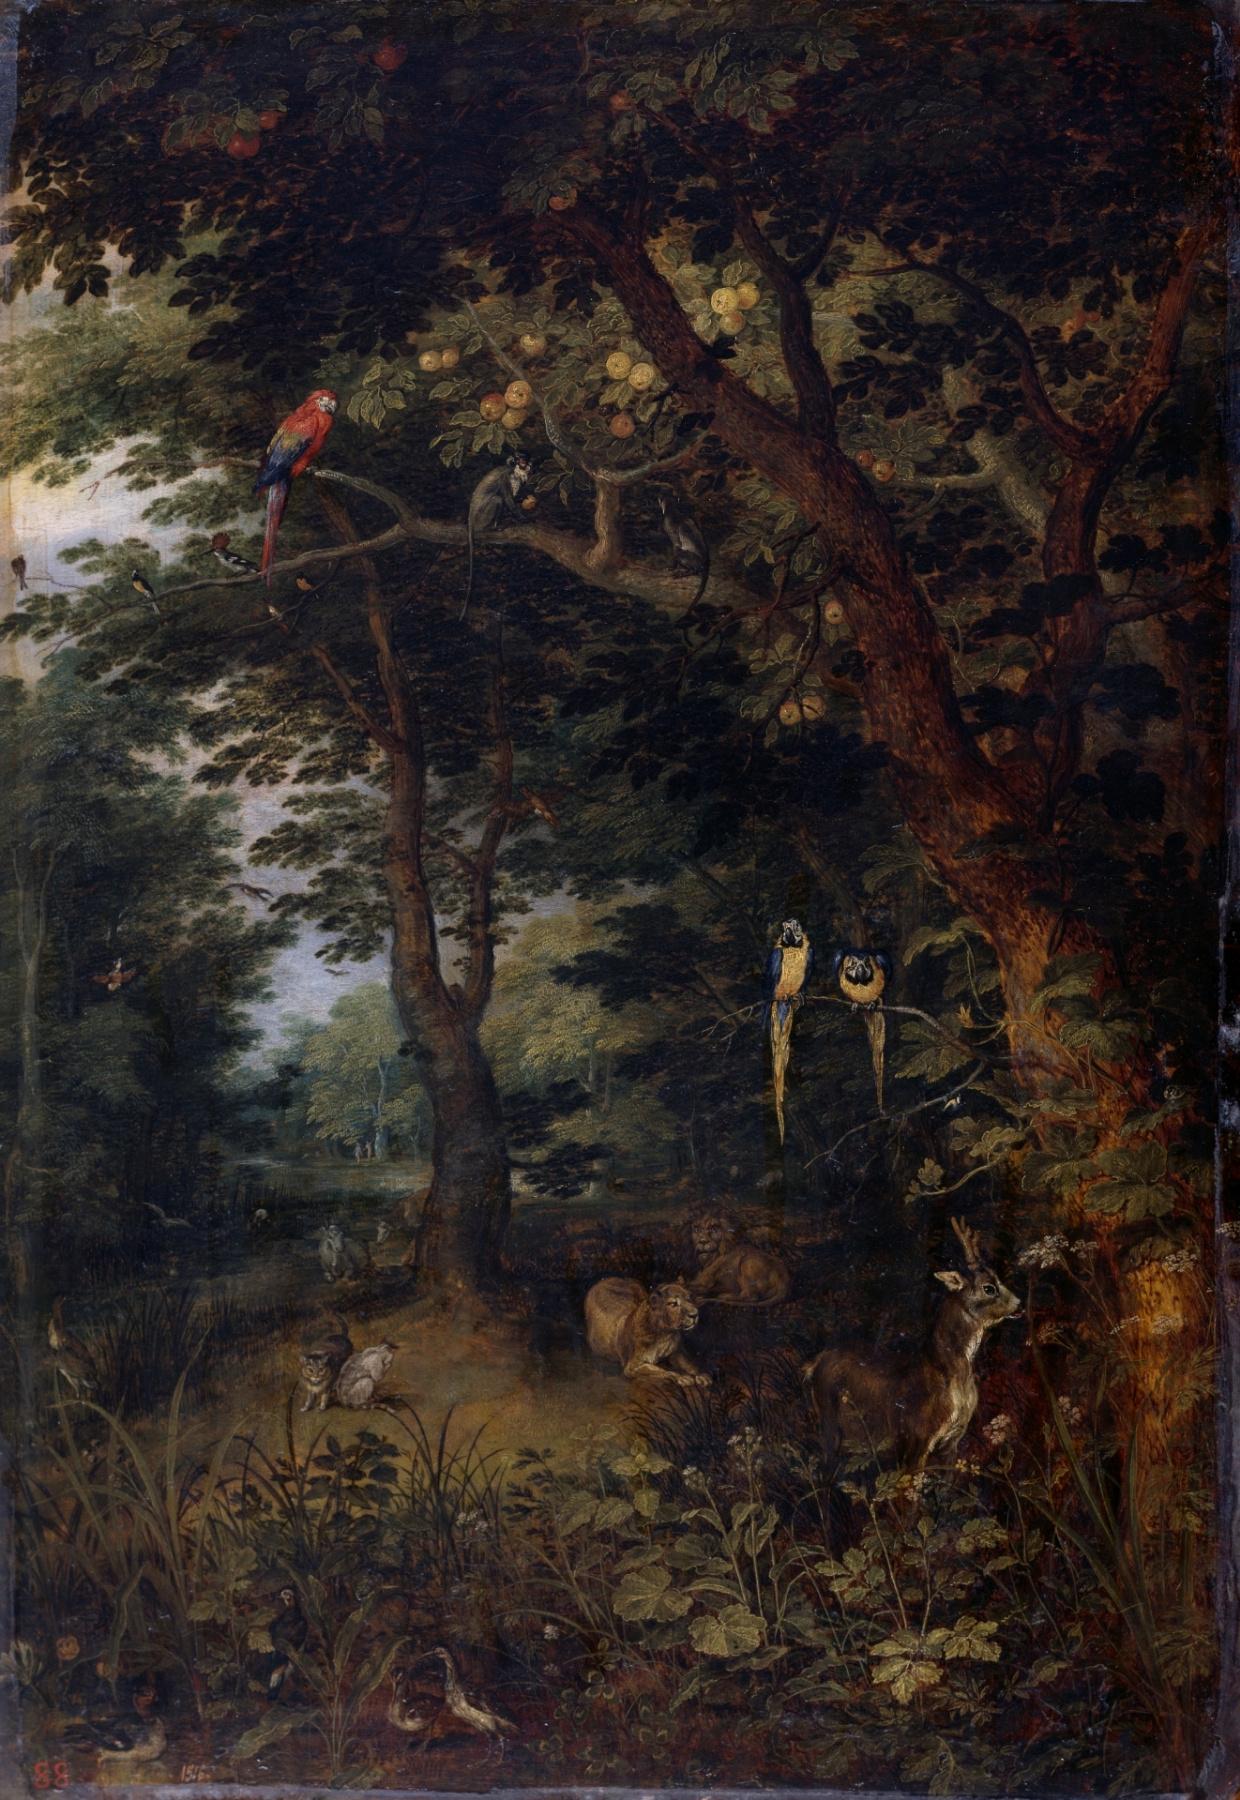 Jan Brueghel the Younger. Heaven on earth